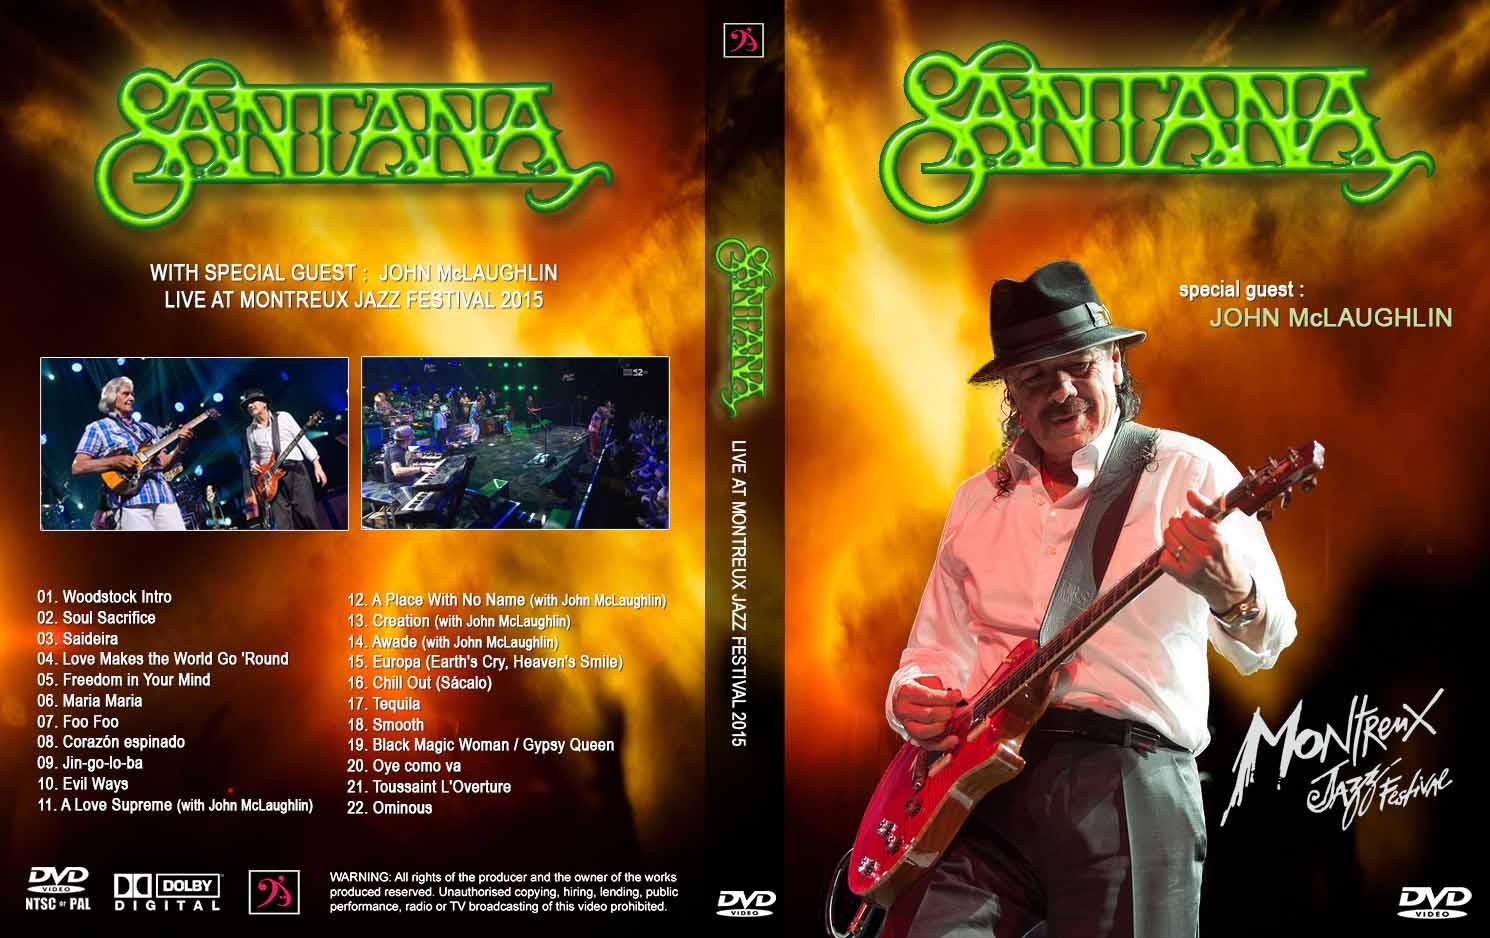 Montreux Jazz Festival 2015 >> Youdiscoll Santana Montreux Jazz Festival 2015